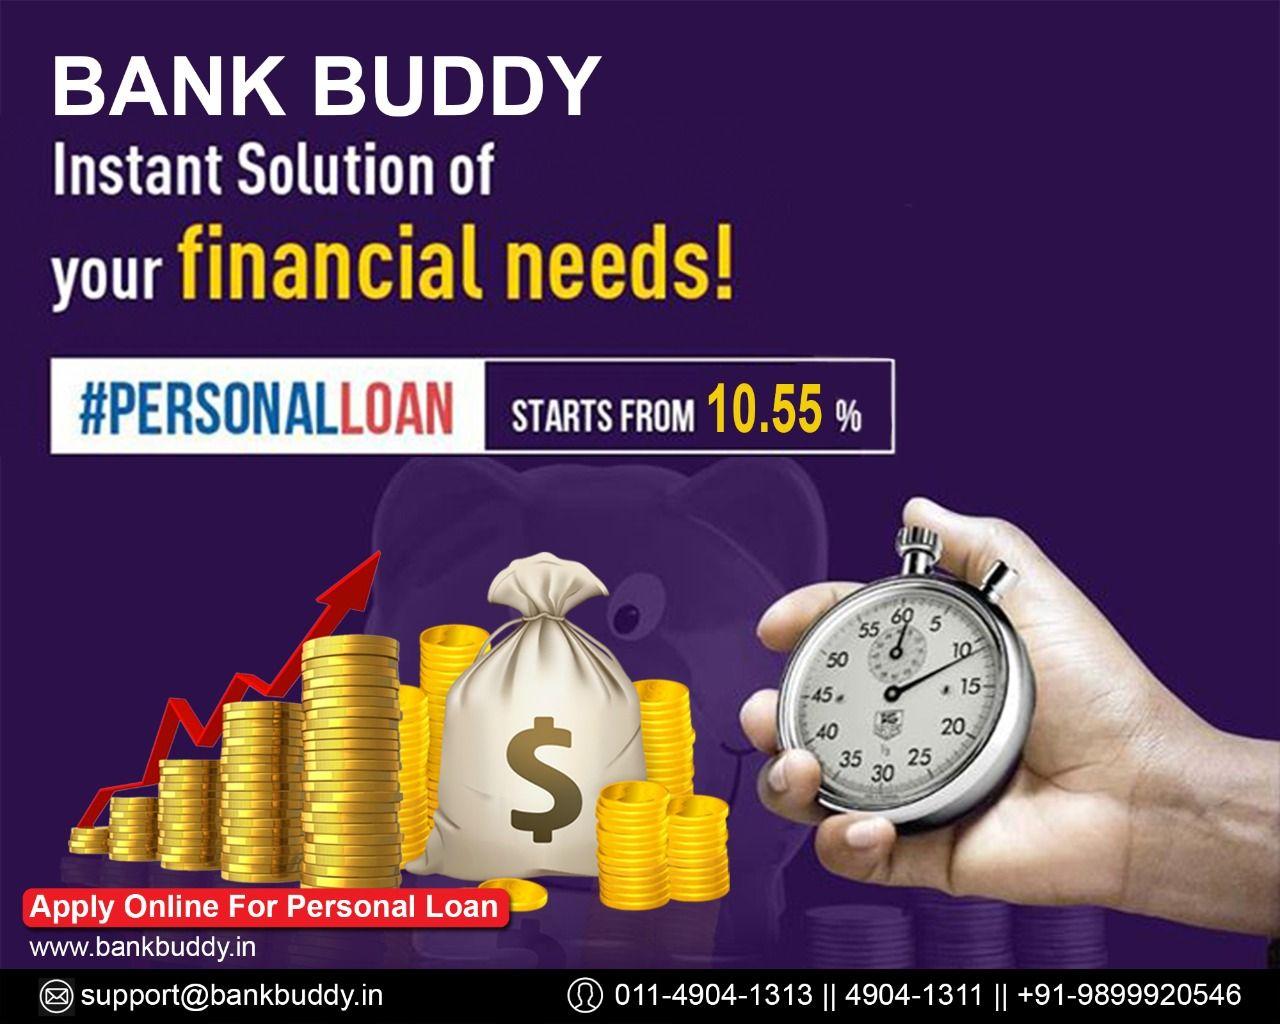 Bank Buddy Give Personal Loan Starts From 10 55 In 2020 Personal Loans Loan Business Loans